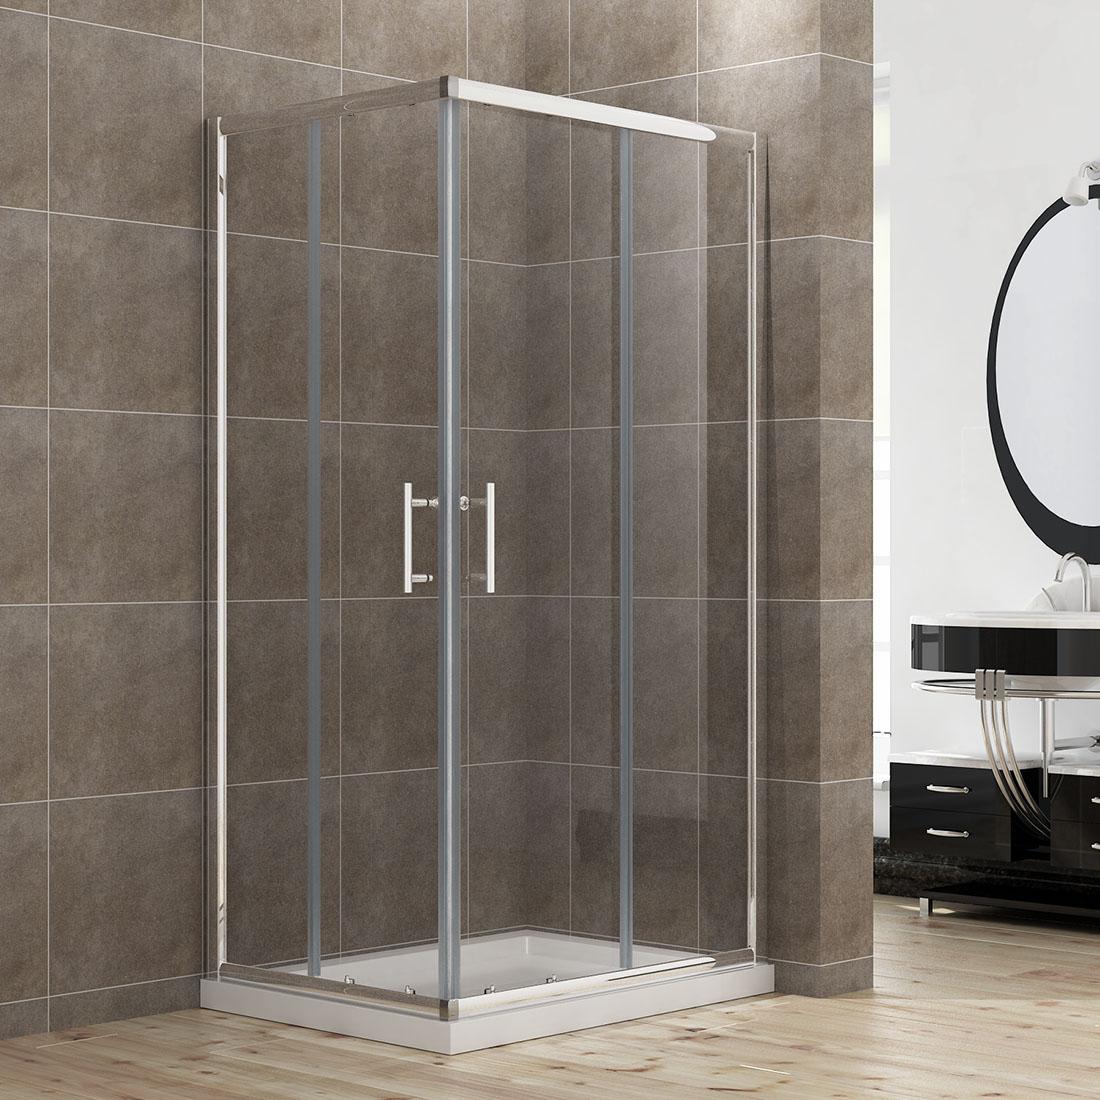 760x760mm Corner Entry Sliding Shower Door Cubicle